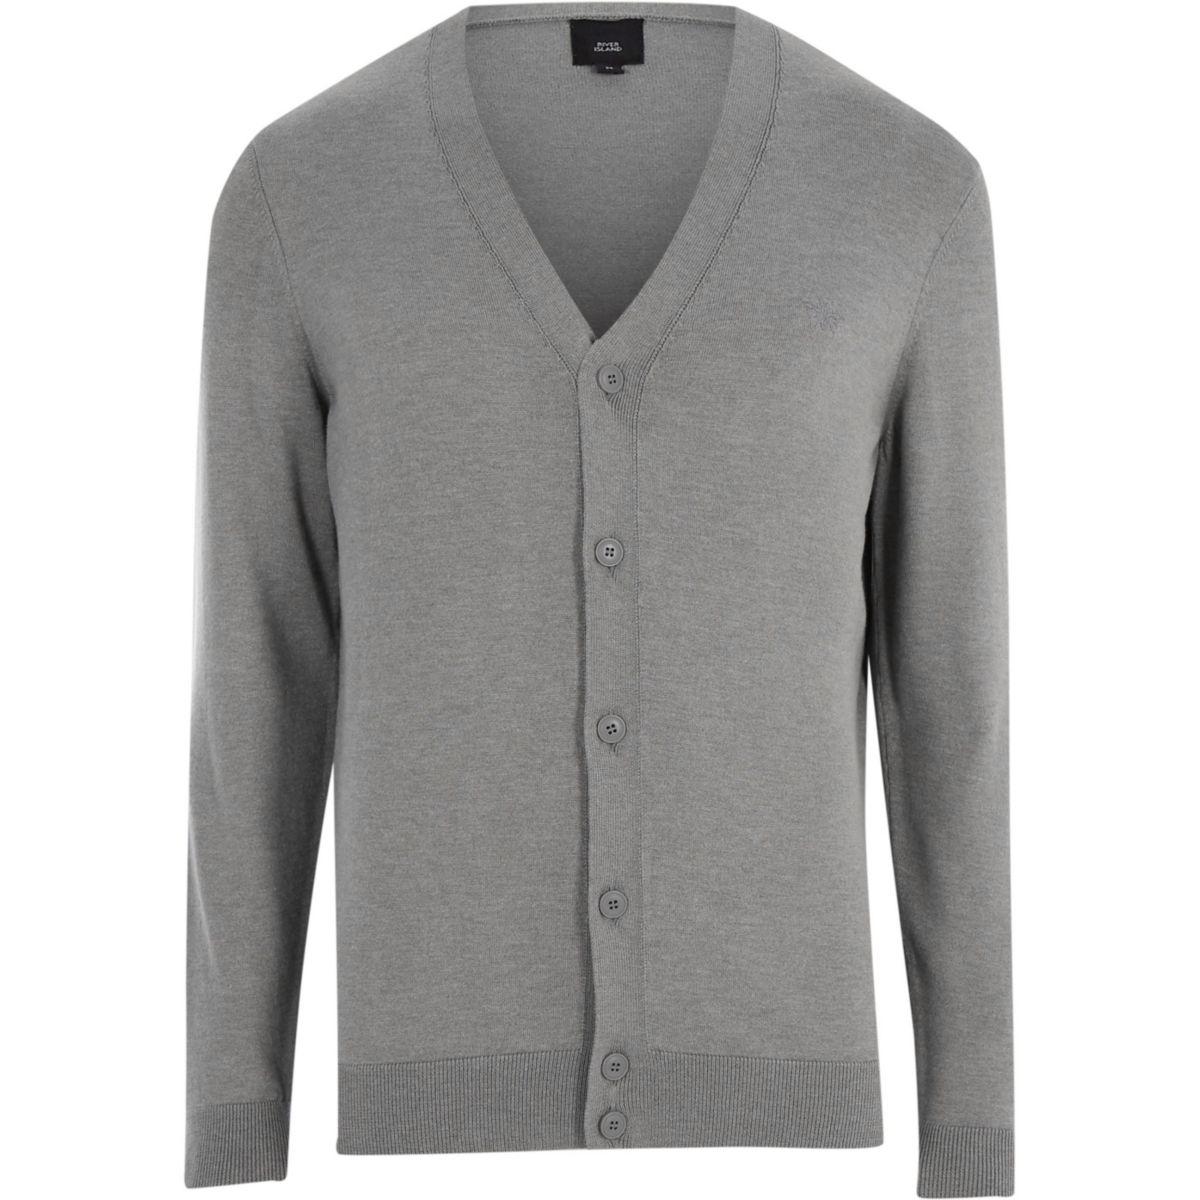 V up neck button cardigan Grey 1dxHqHgp